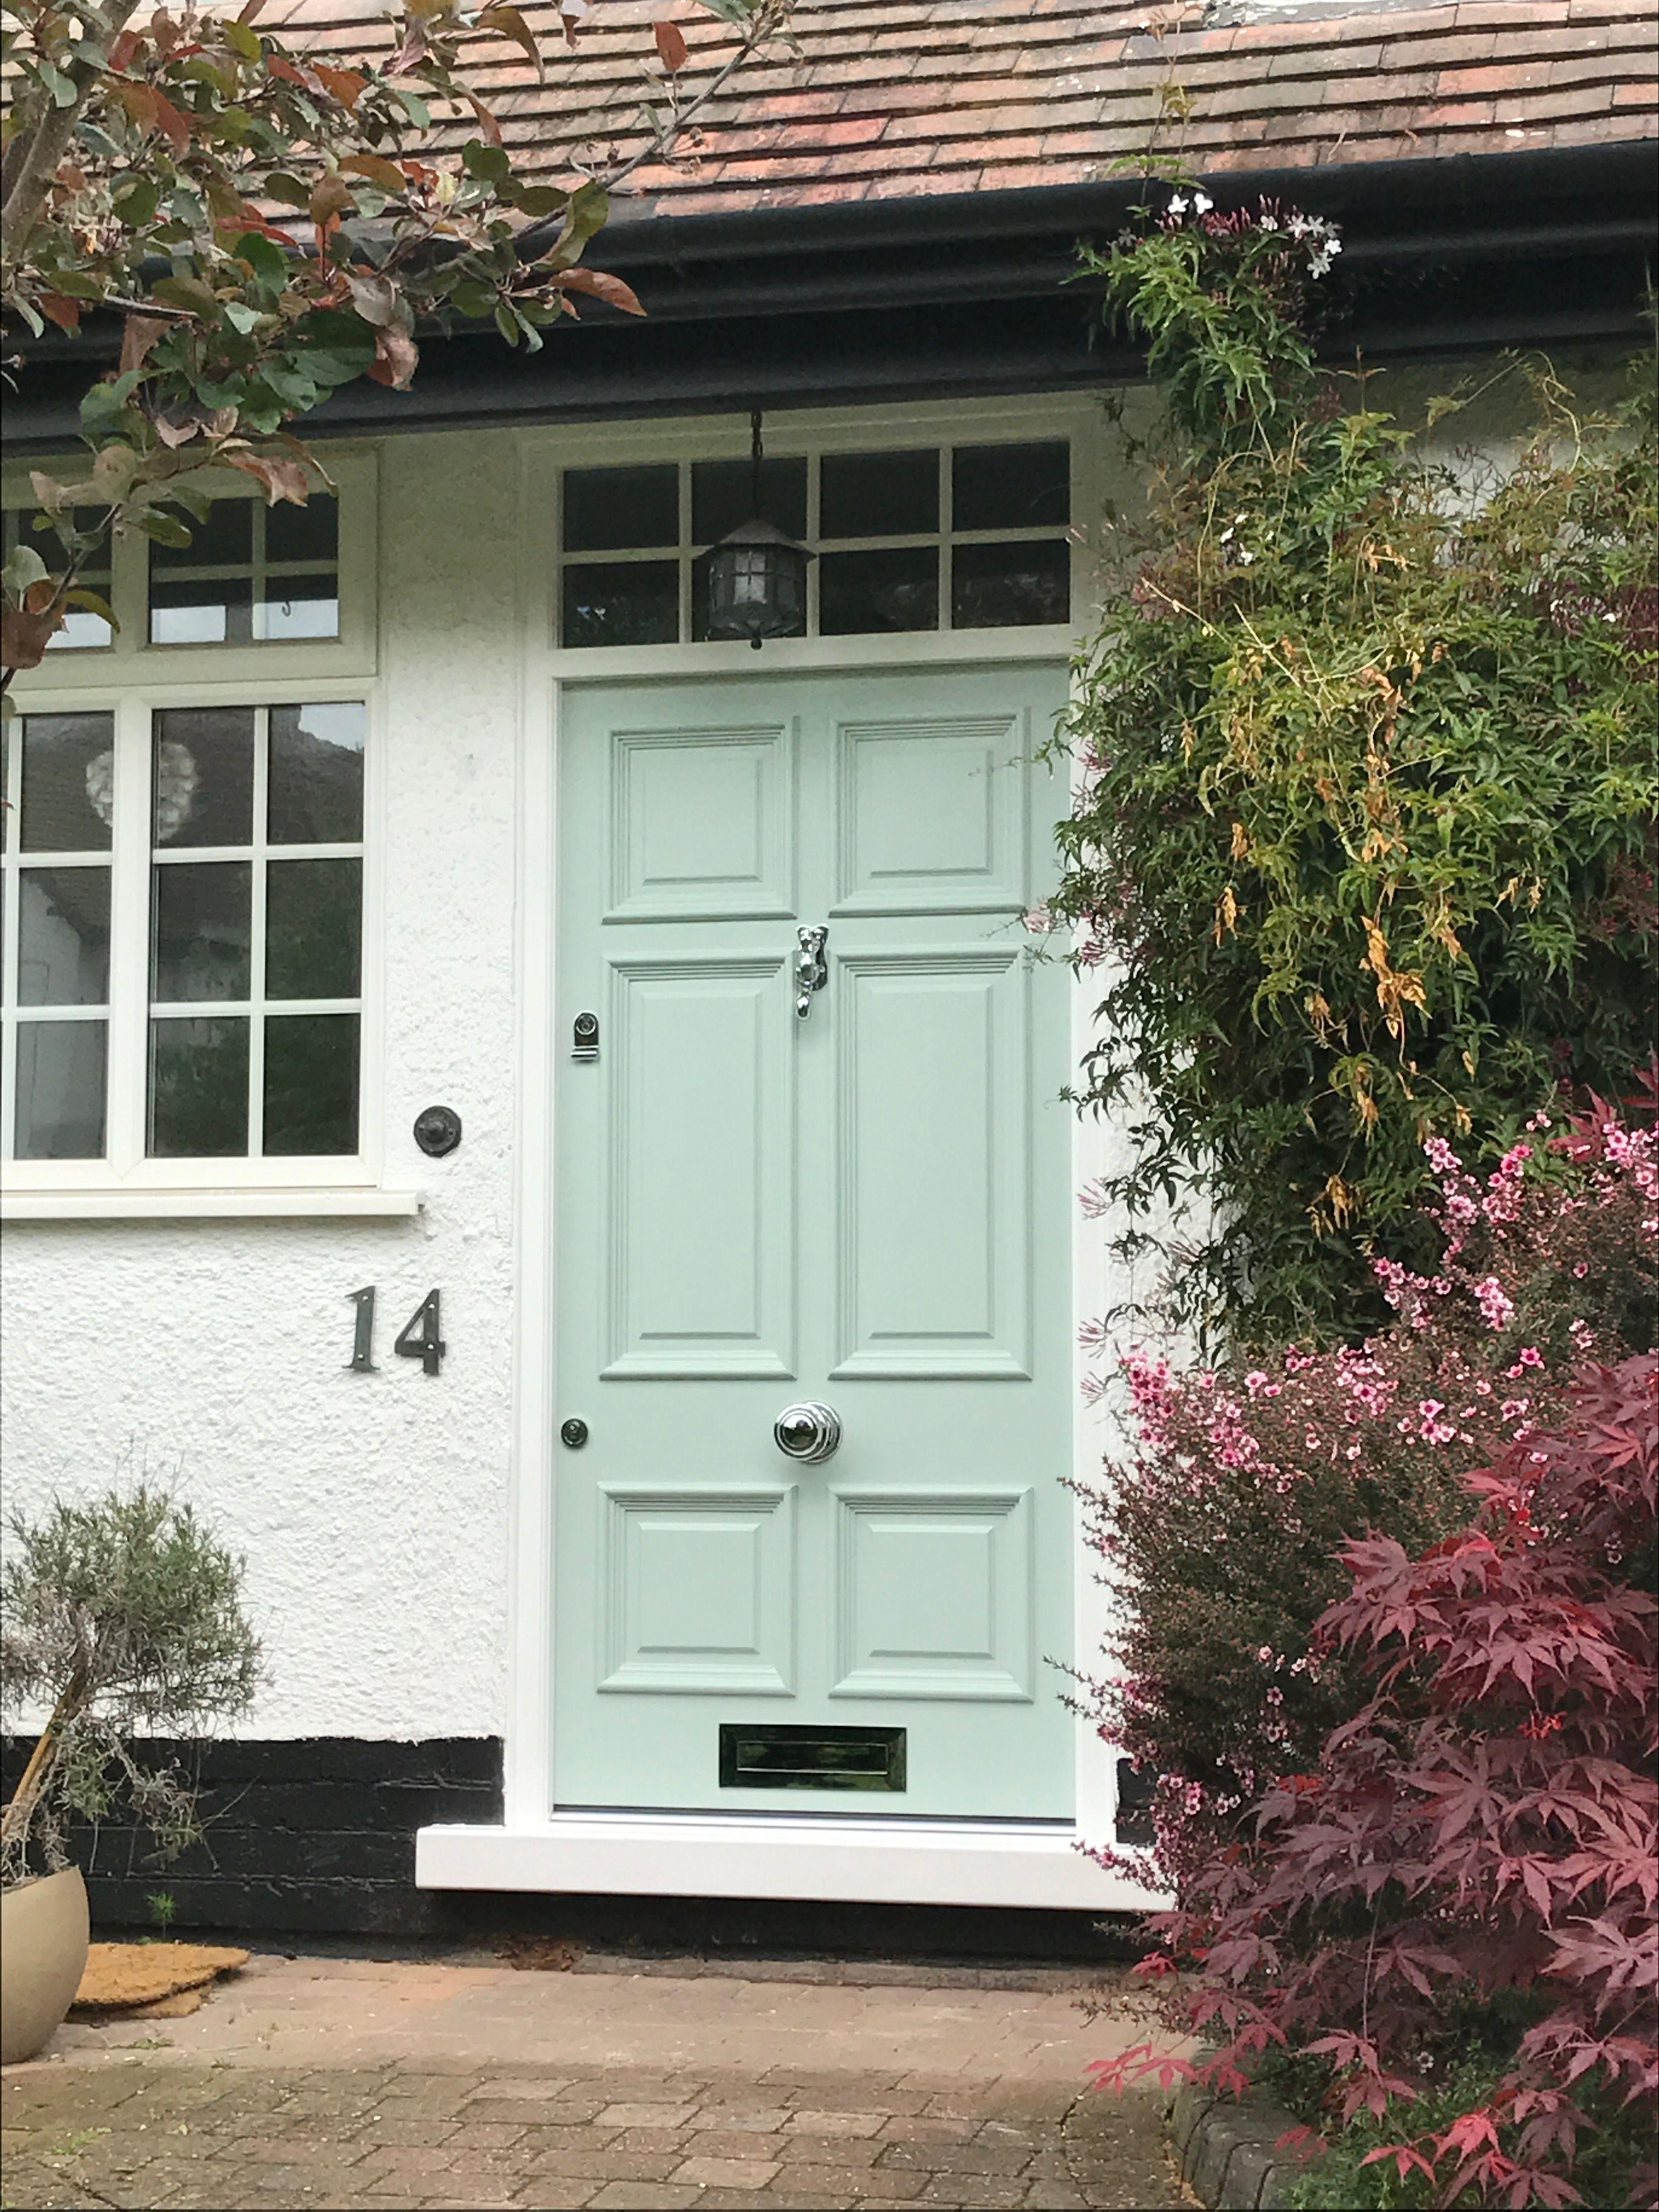 Our New Front Door Farrow Ball Teresa Green Painted Front Doors Green Front Doors Front Door